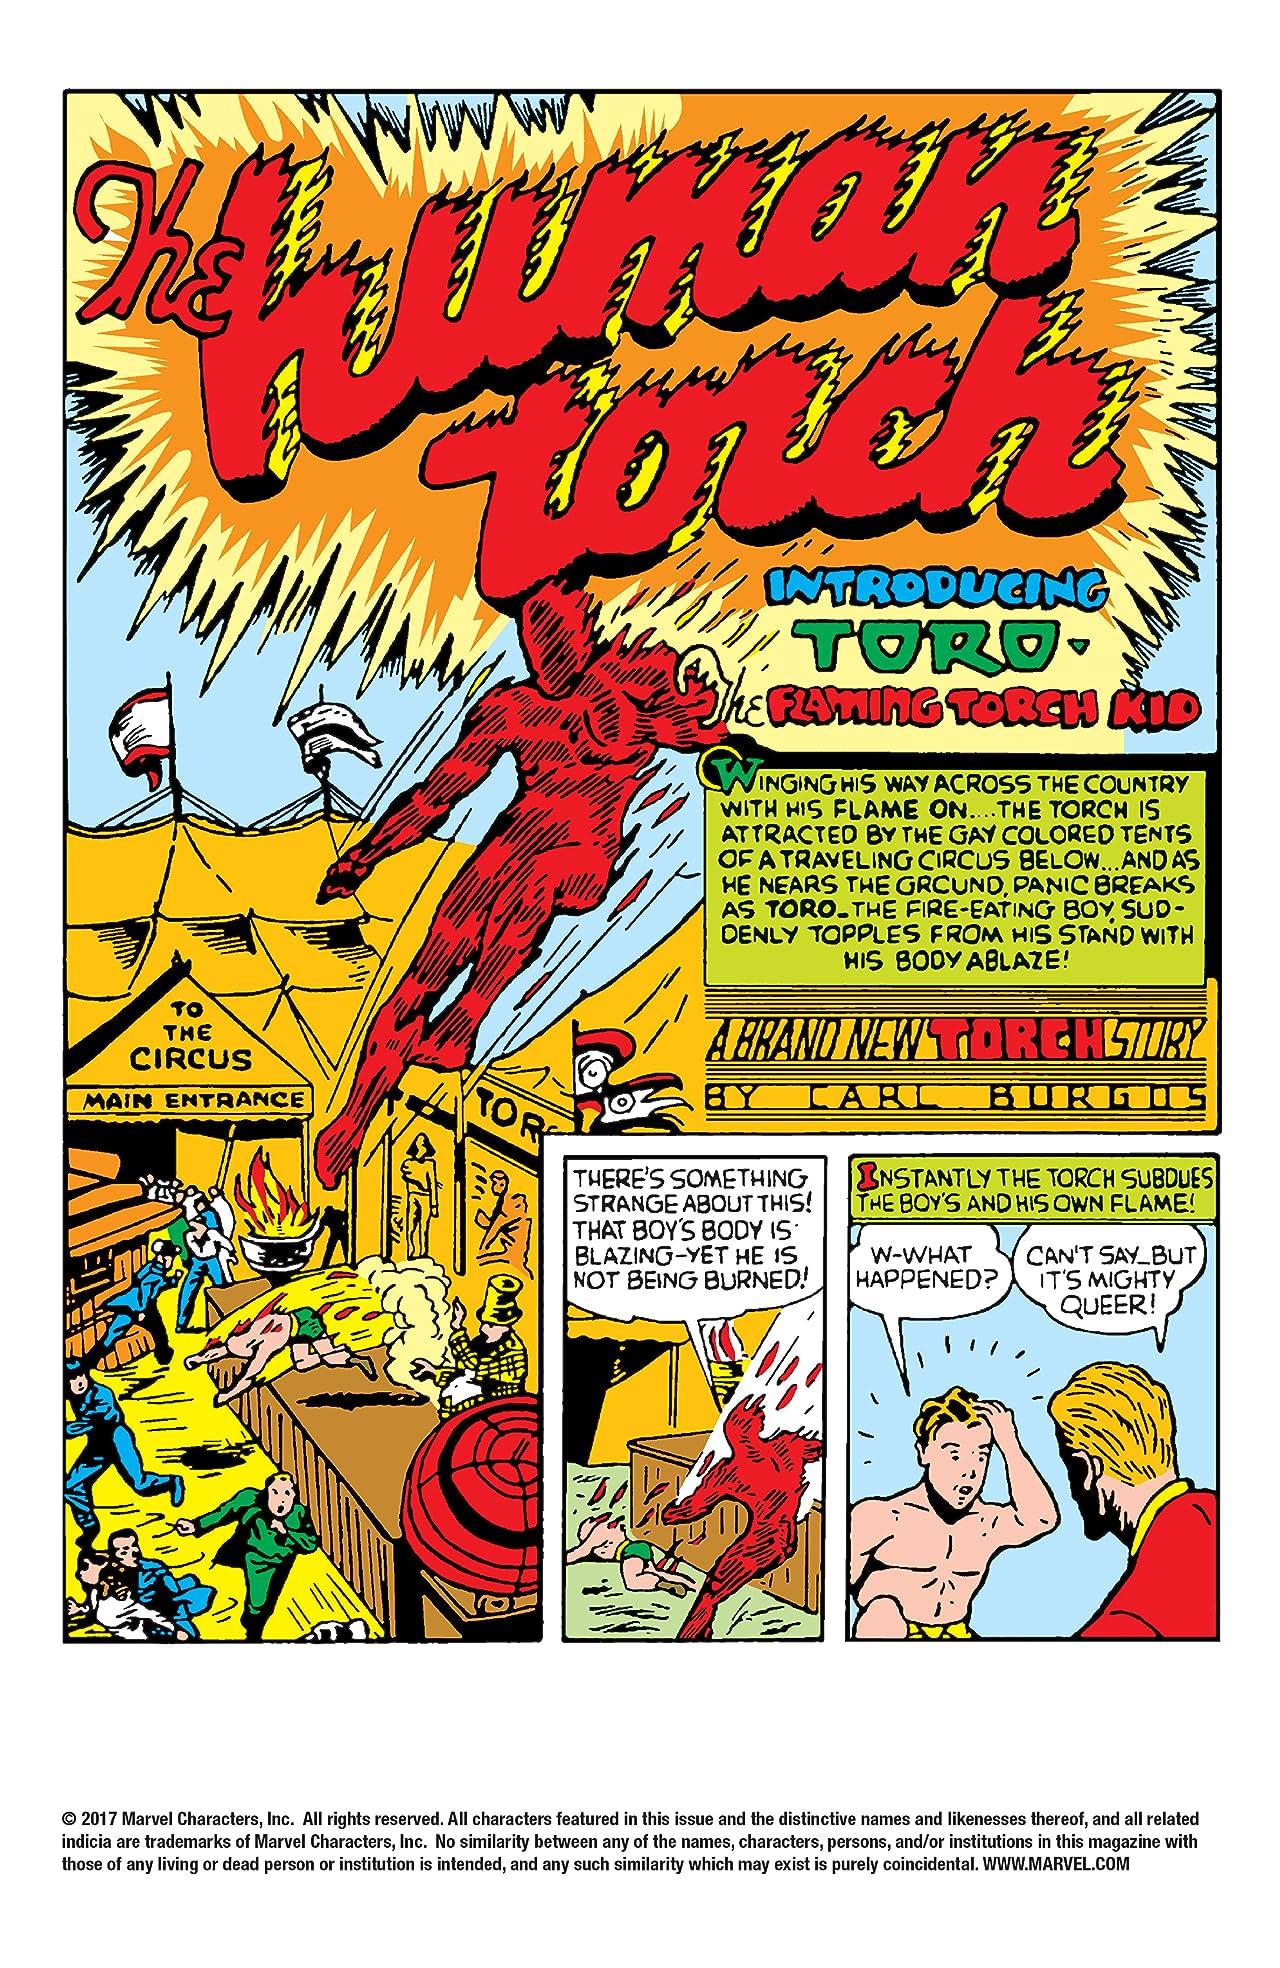 Human Torch (1940-1954) #2